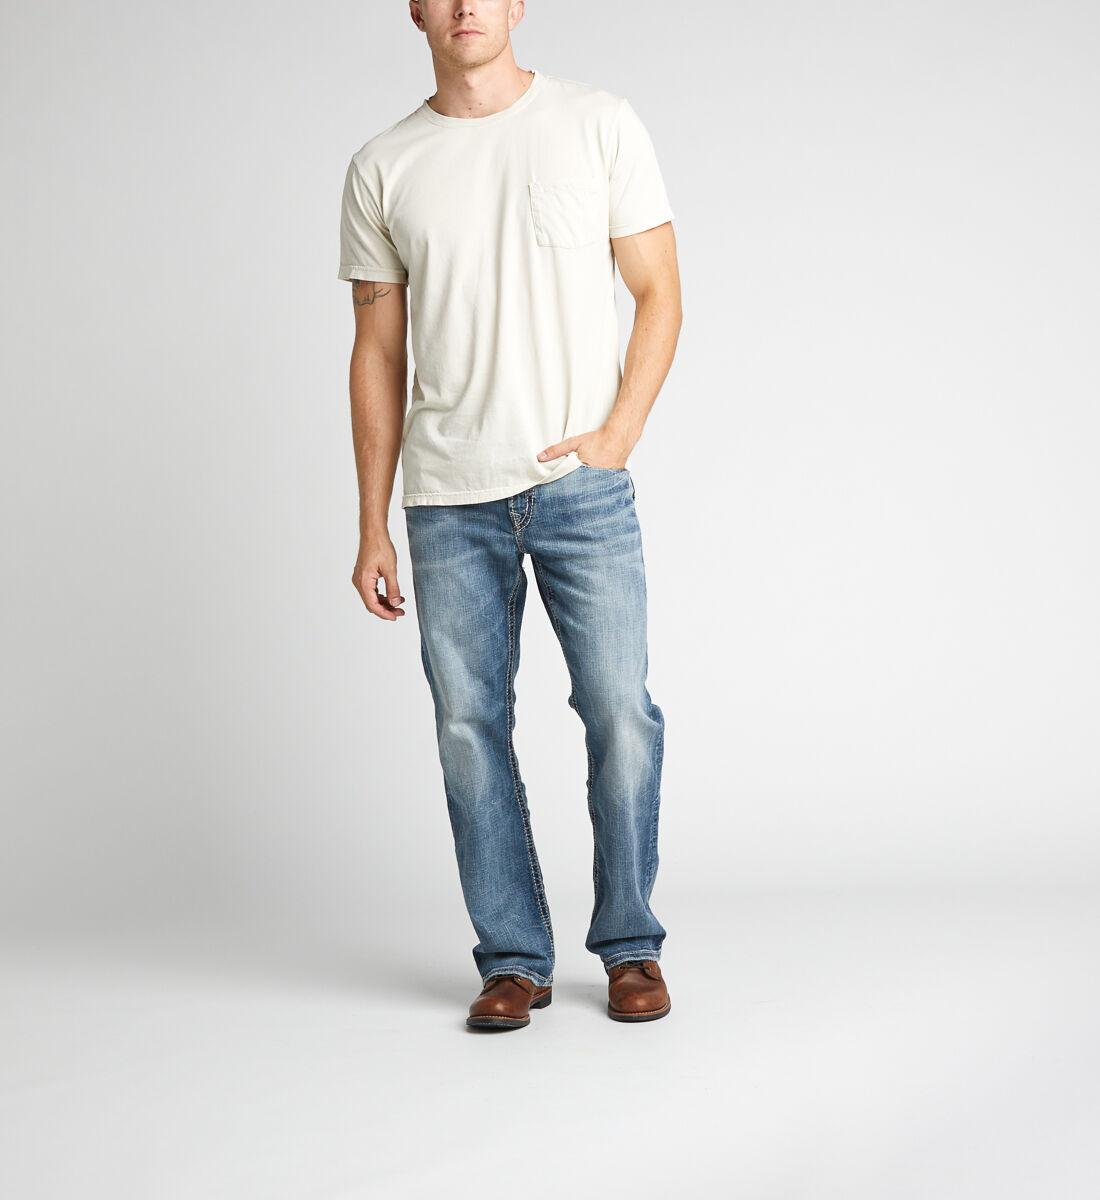 Craig Easy Fit Bootcut Jeans Alt Image 1